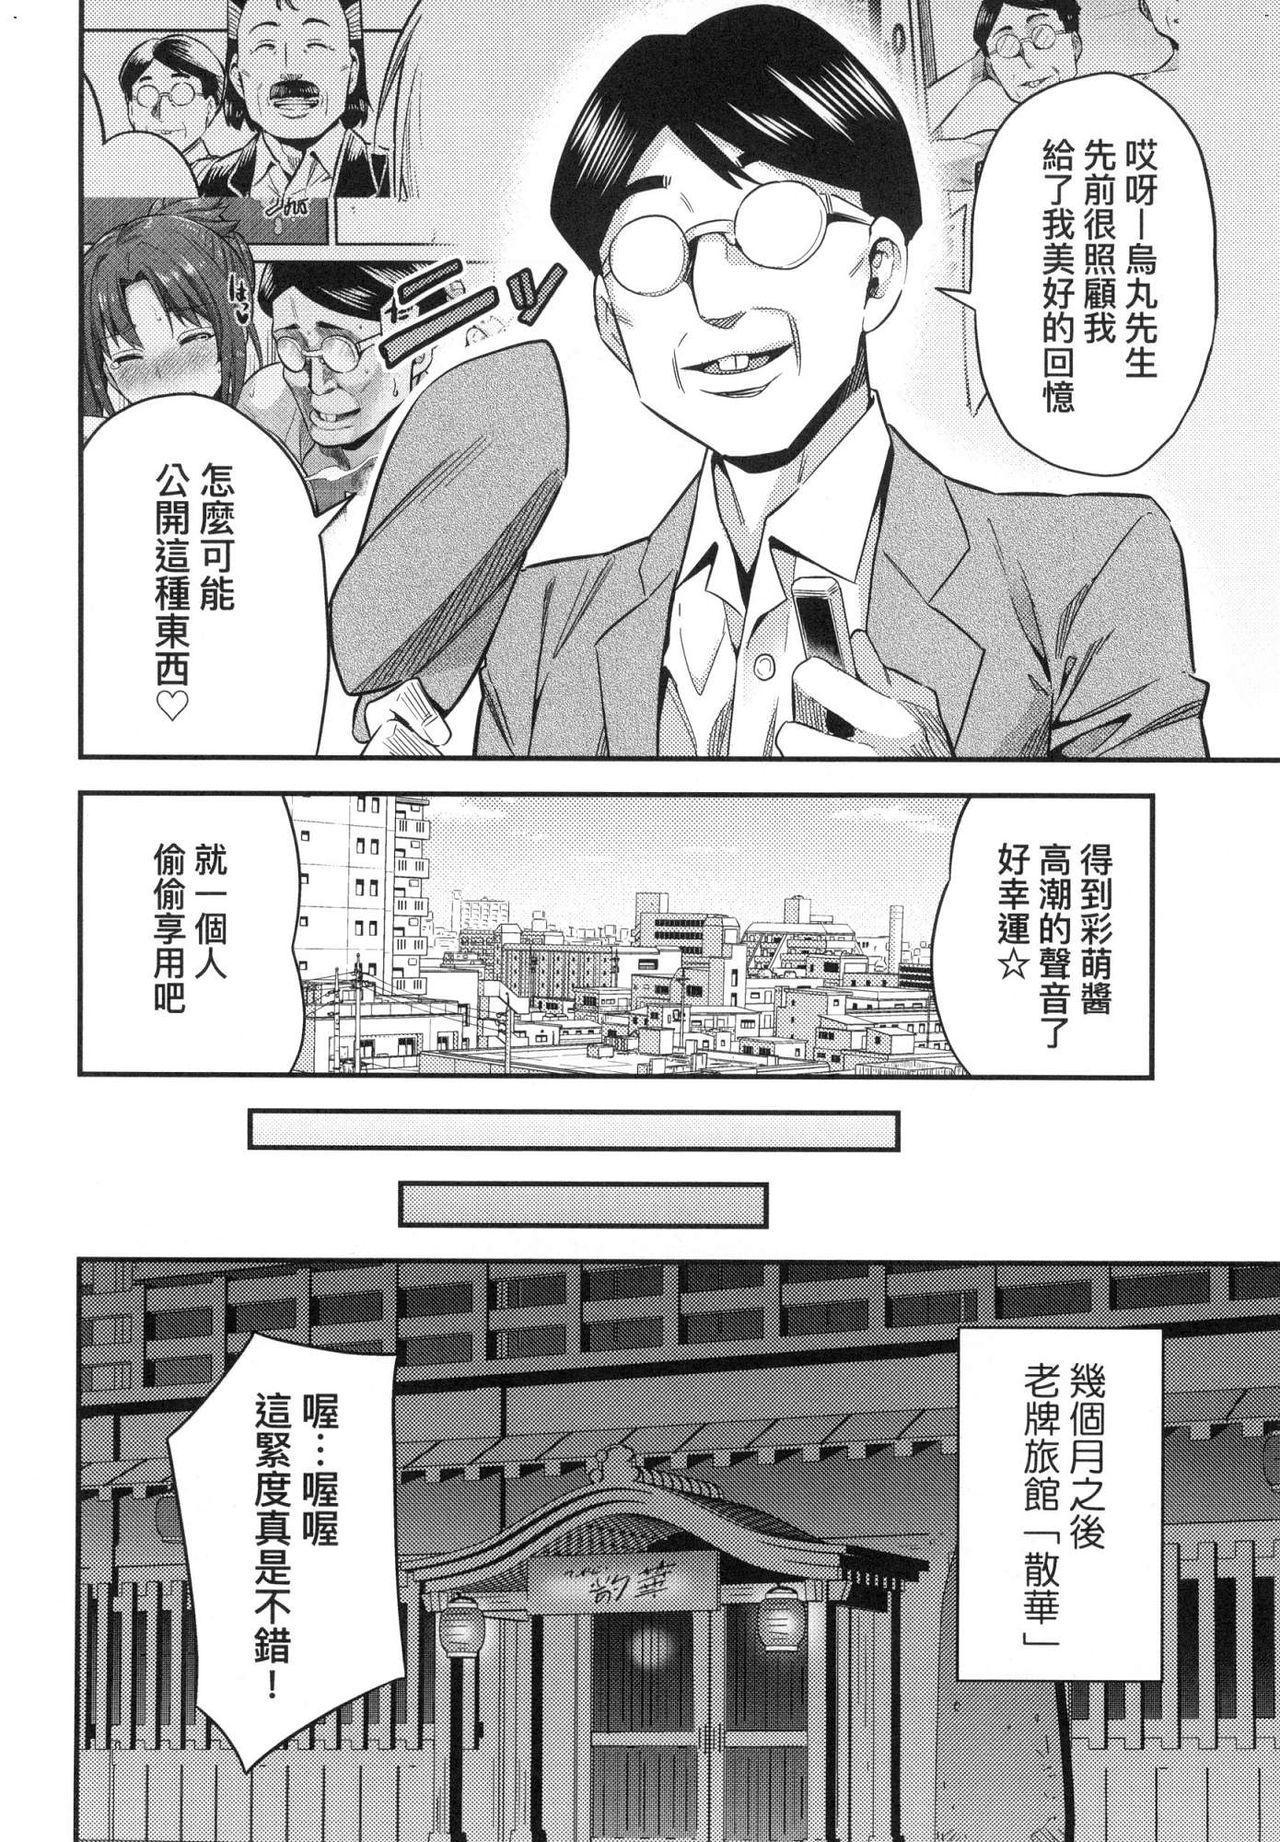 Kyousei Tanetsuke Express - Forced Seeding Express 215